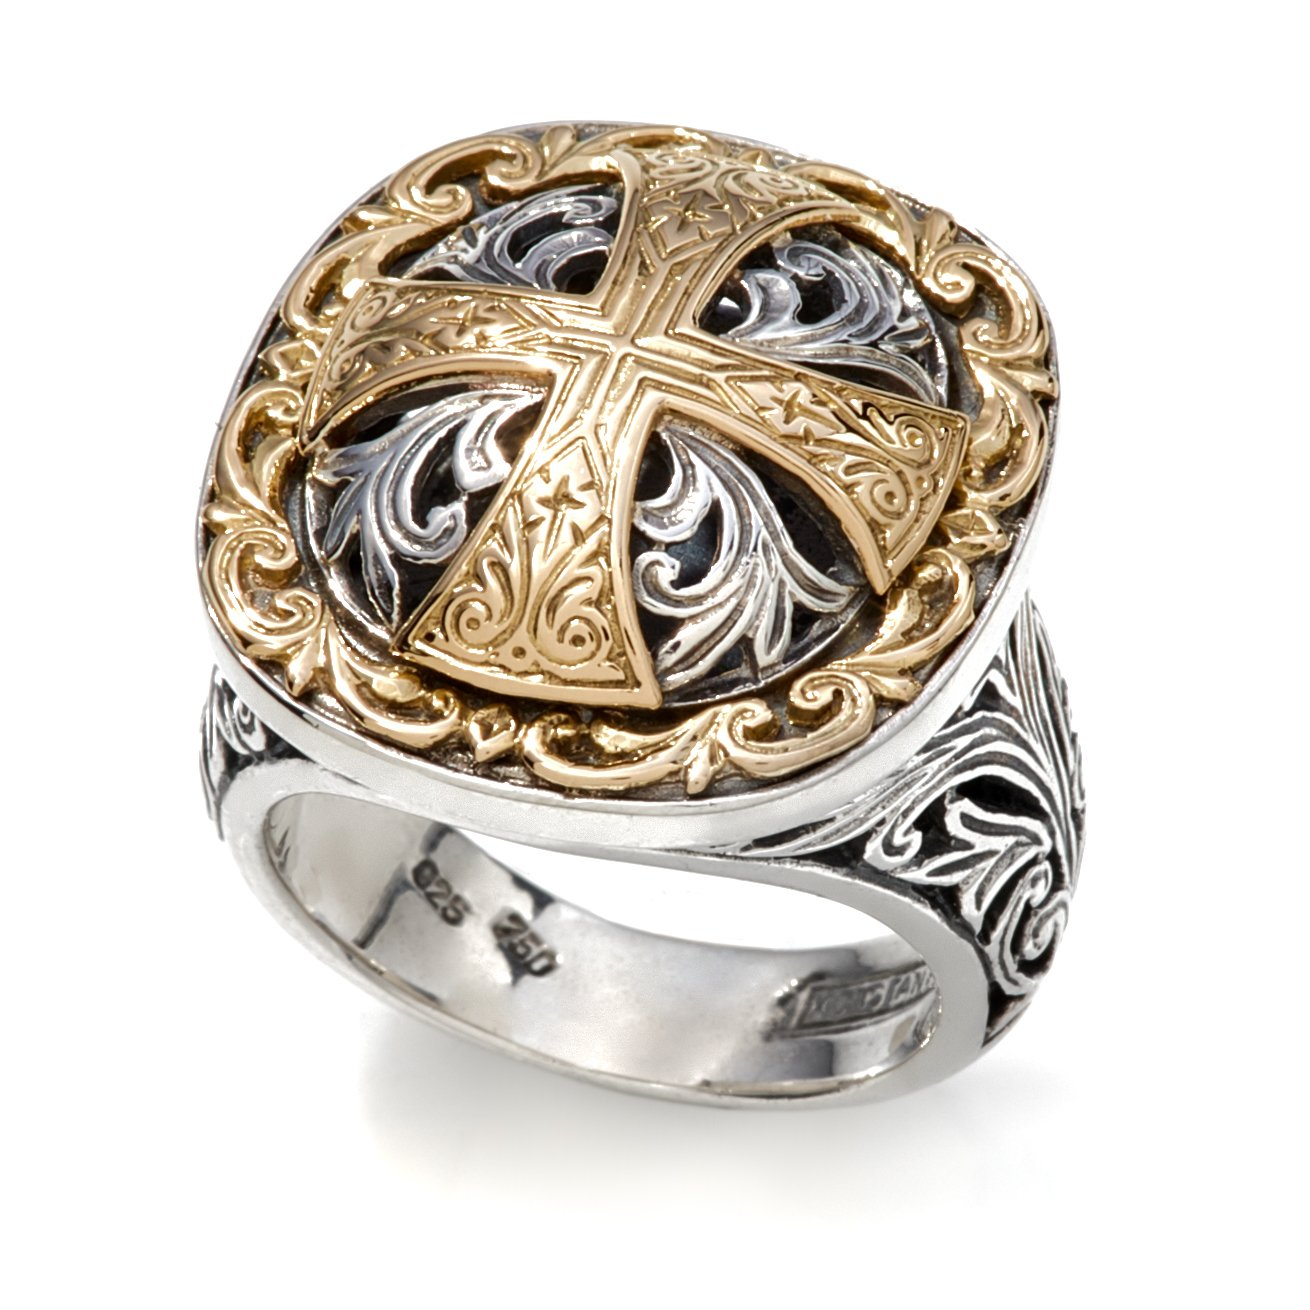 Konstantino Women's Silver & 18k Gold 66 Ring, Size 8